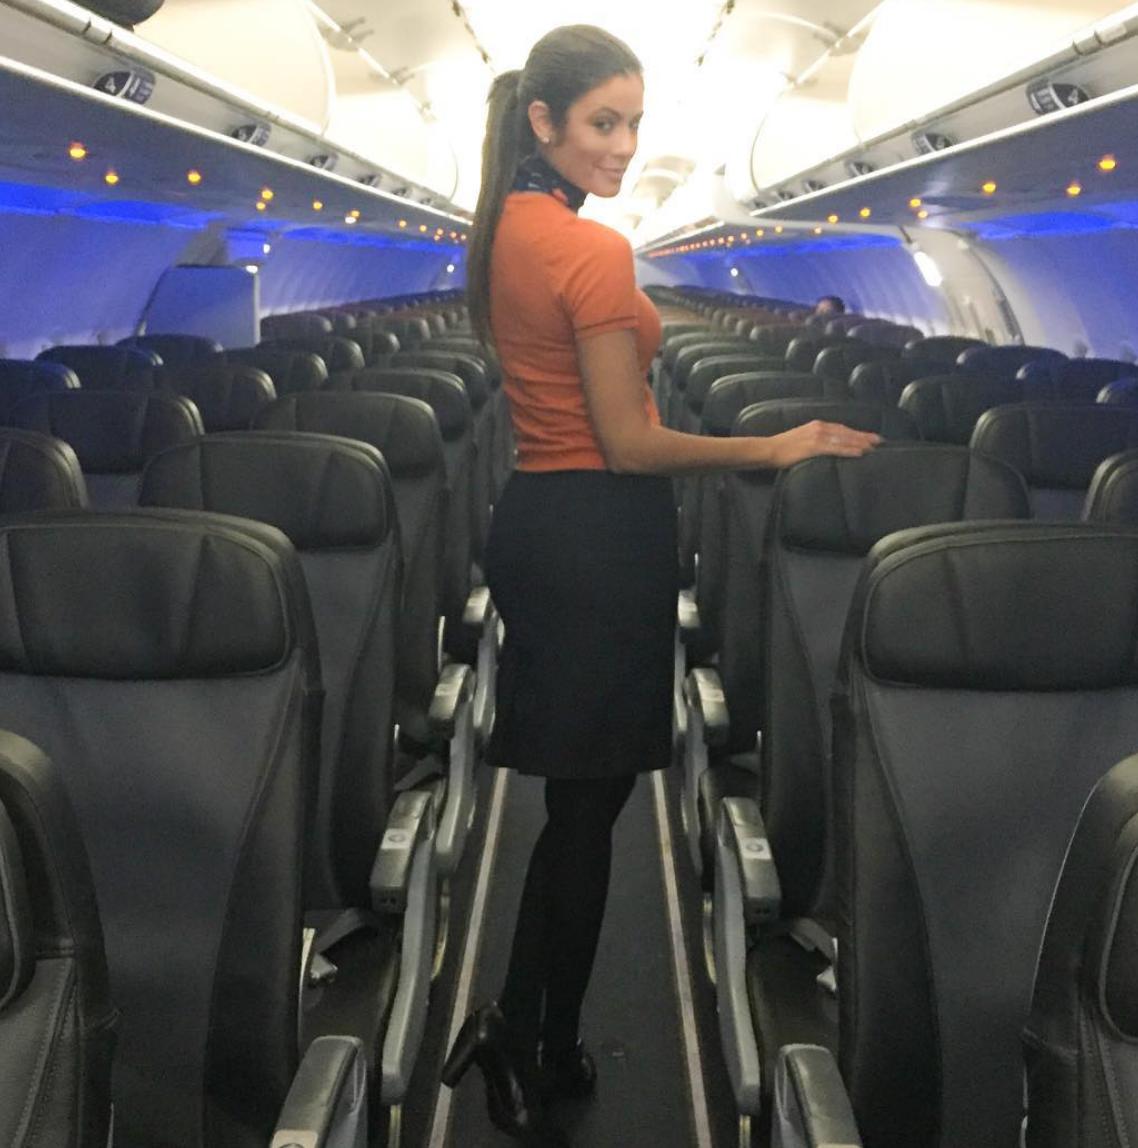 Flight attendant dating site